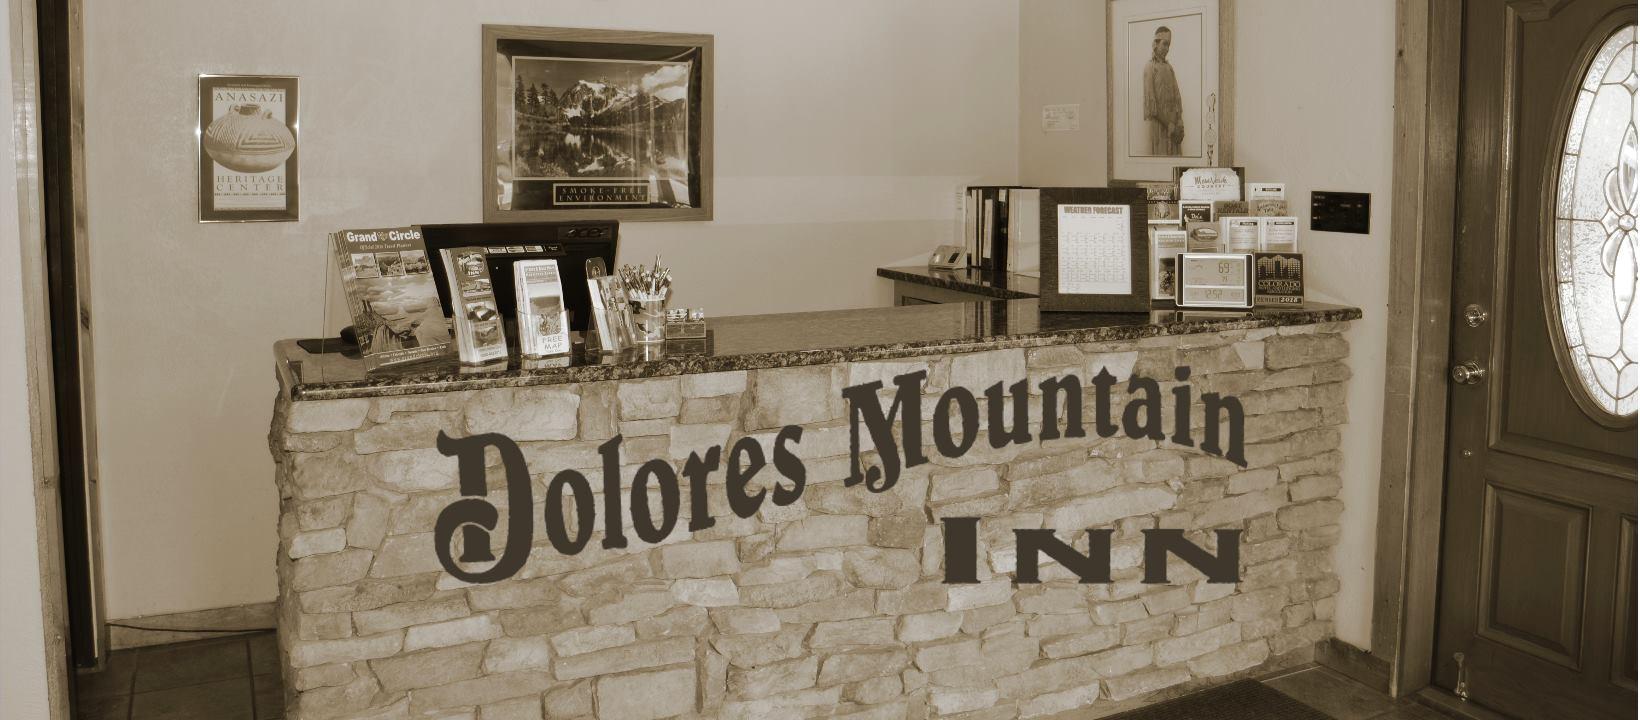 image of Dolores mountain inn